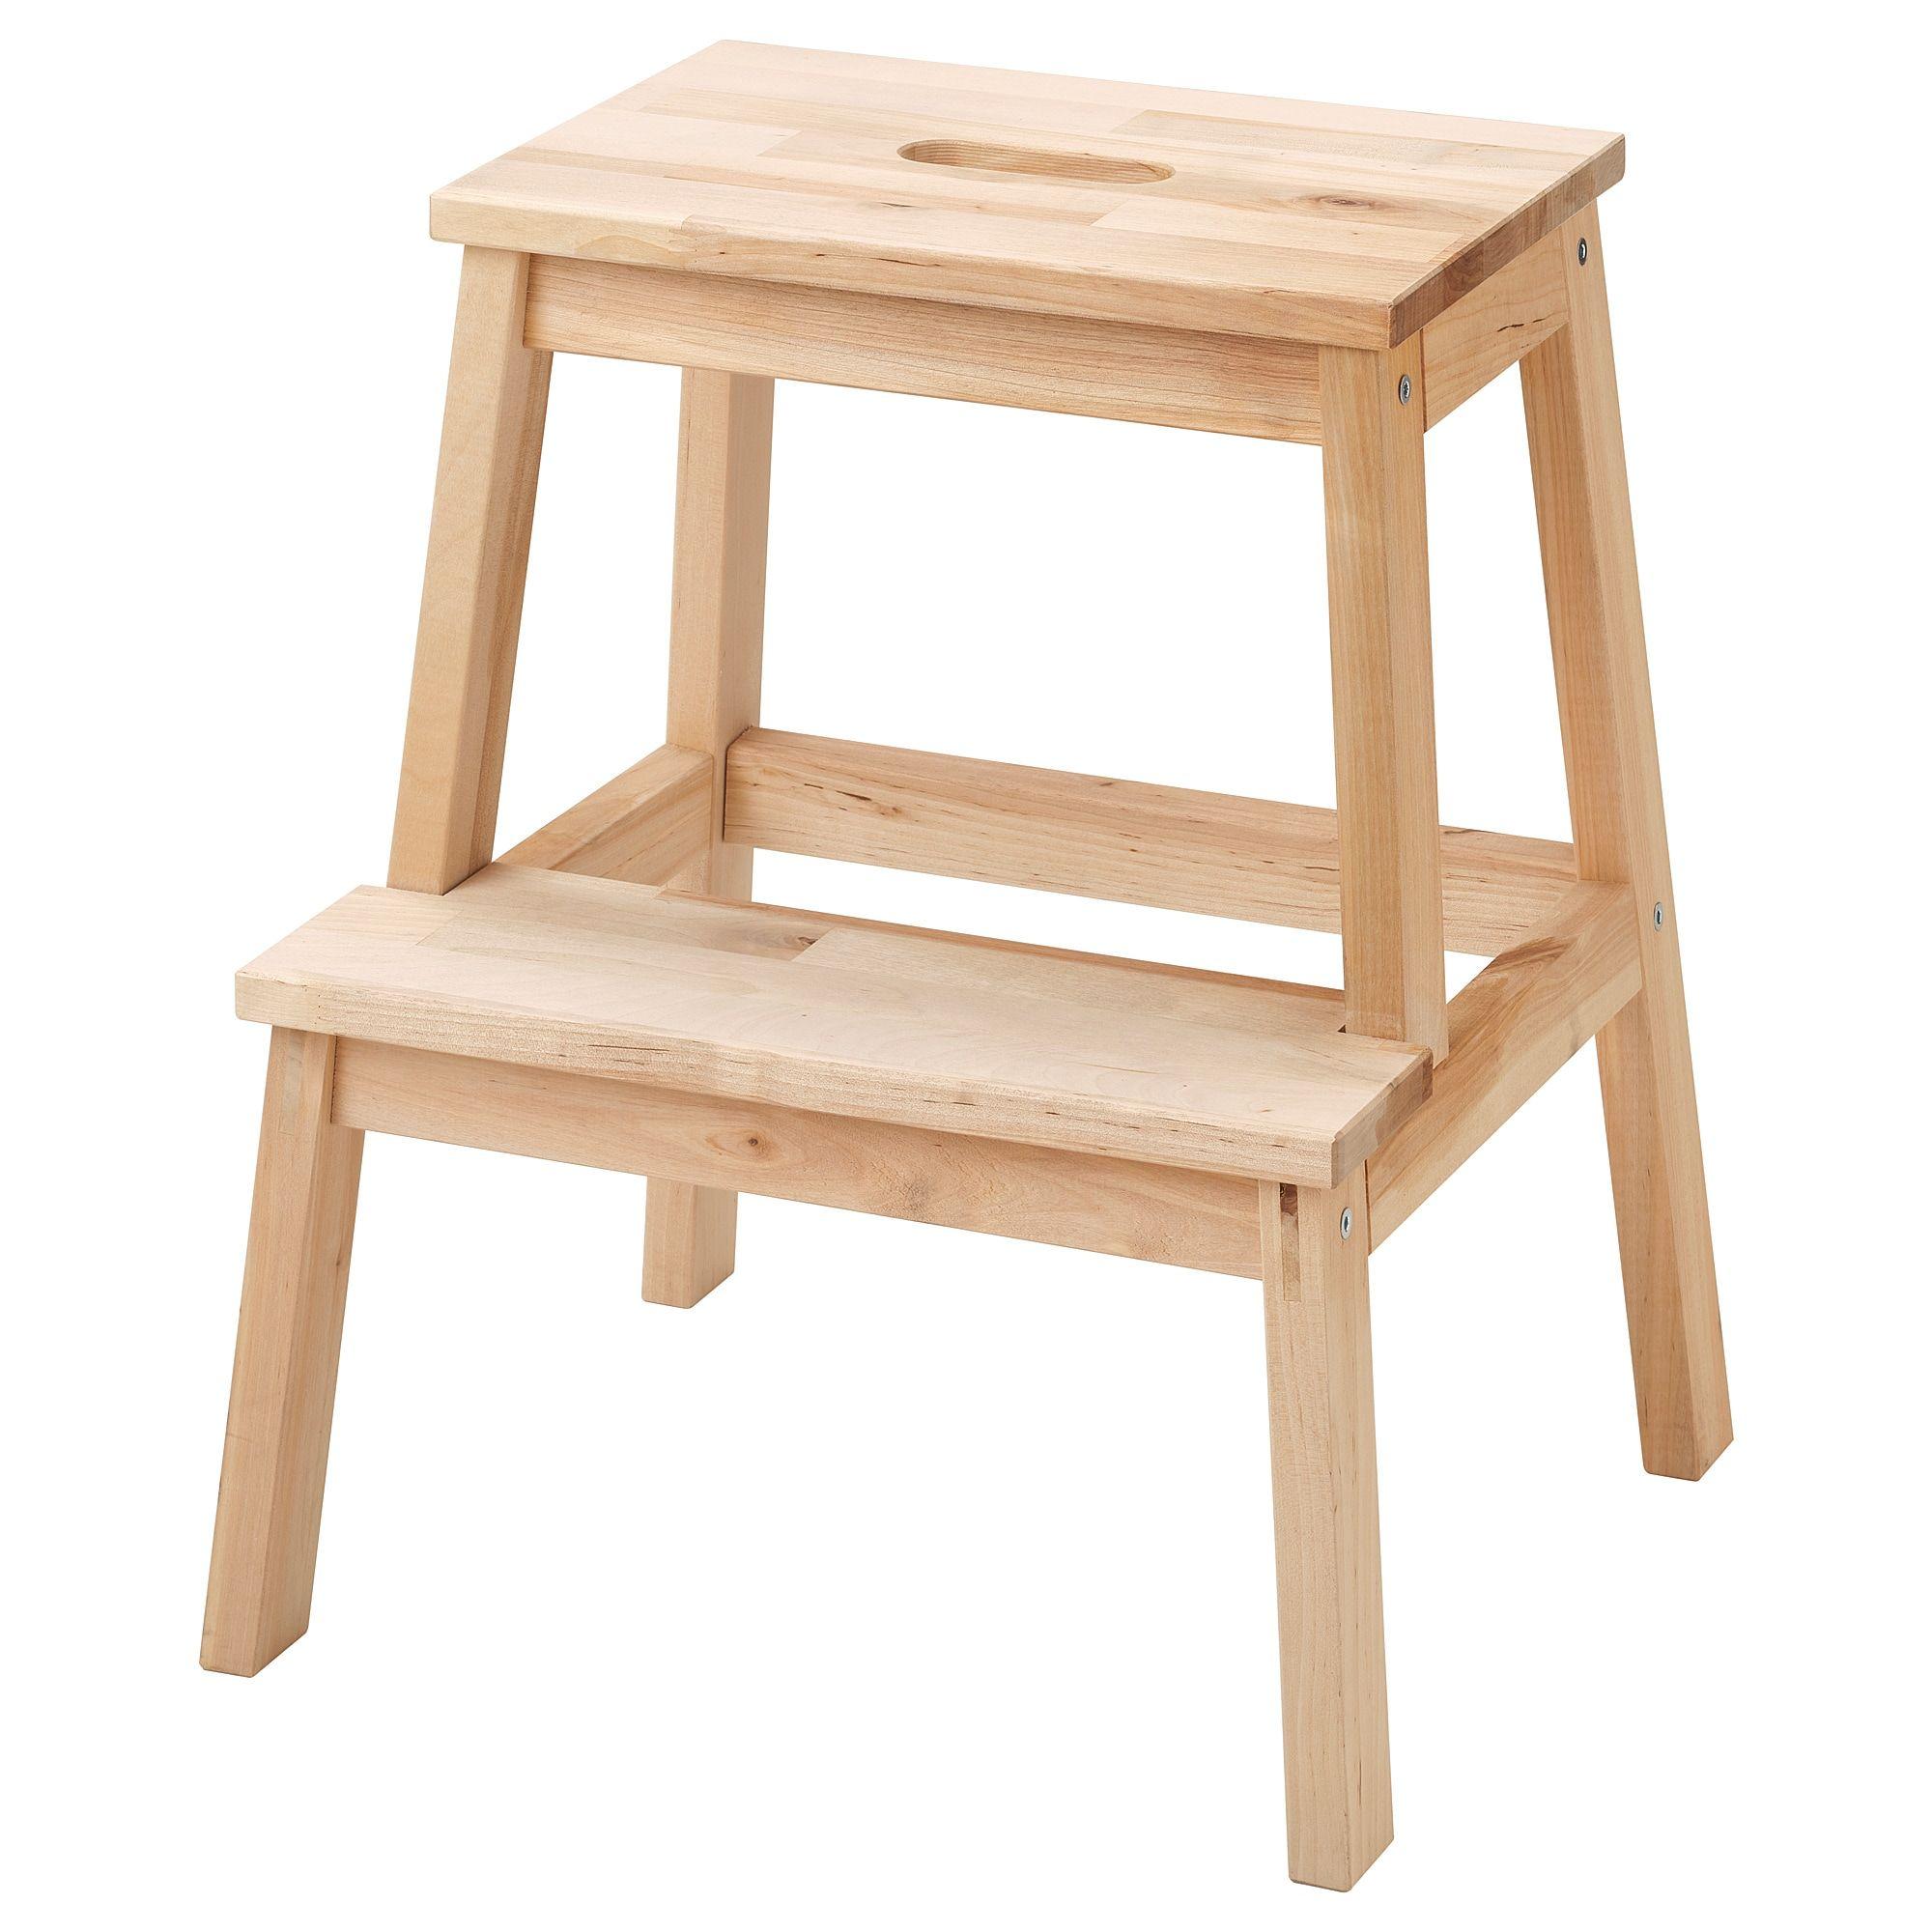 Us Furniture And Home Furnishings Step Stool Ikea Step Stool